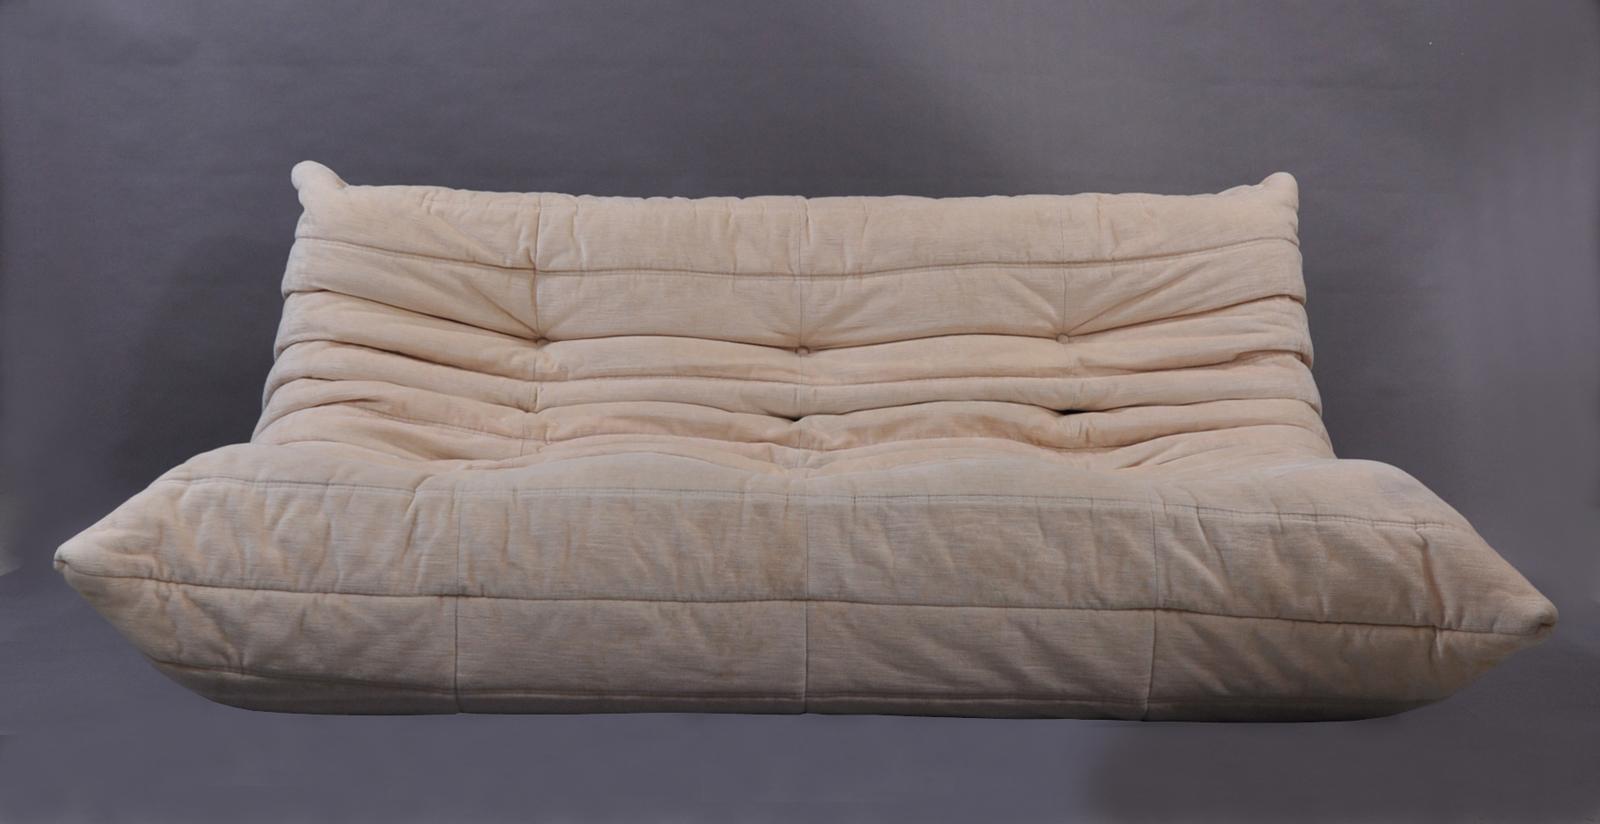 canap togo velours vintage modulolab. Black Bedroom Furniture Sets. Home Design Ideas